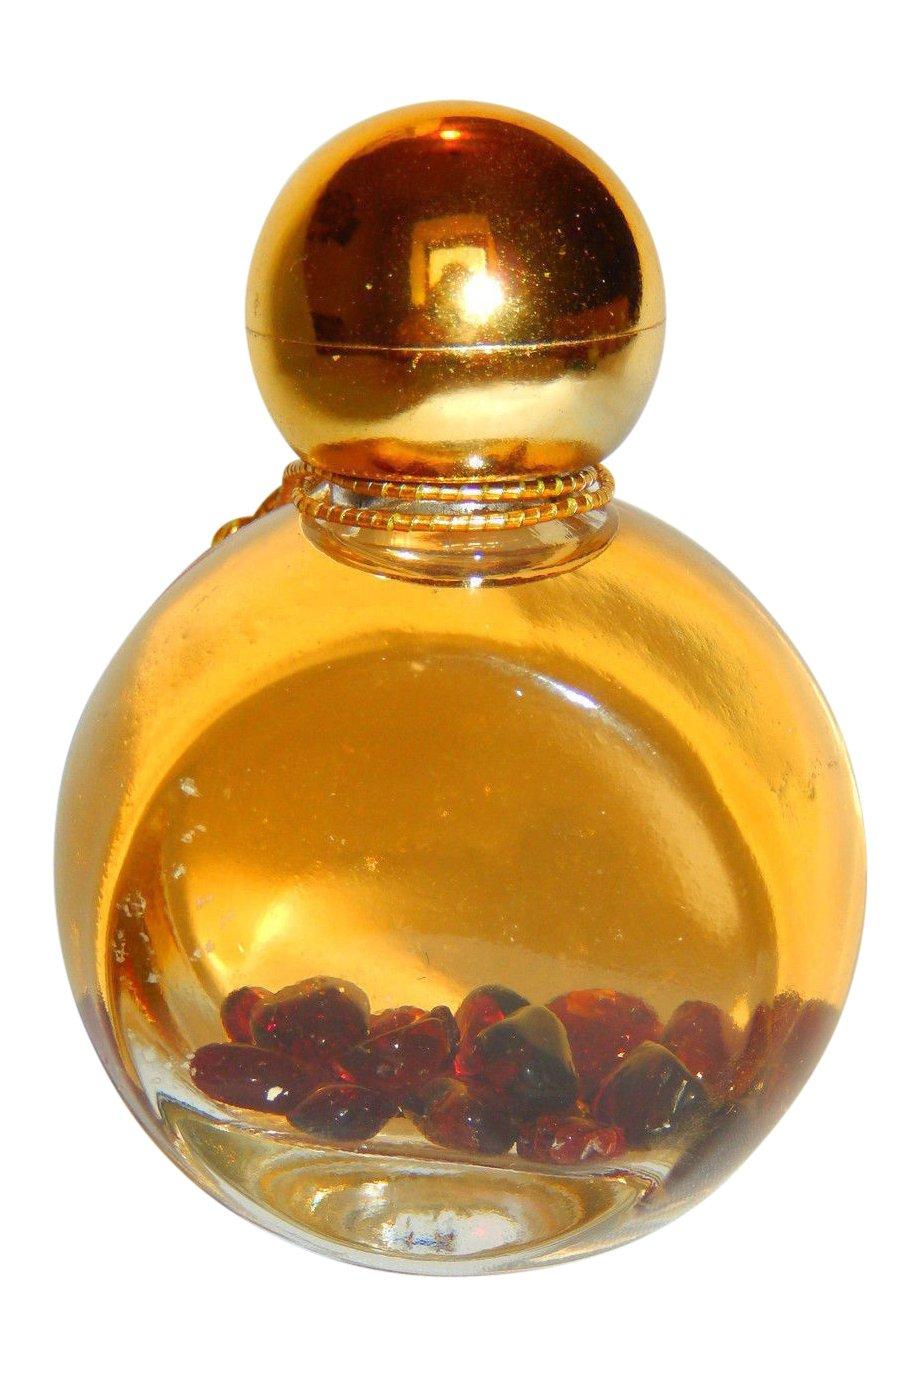 christian lorz granat edelstein parfum reviews